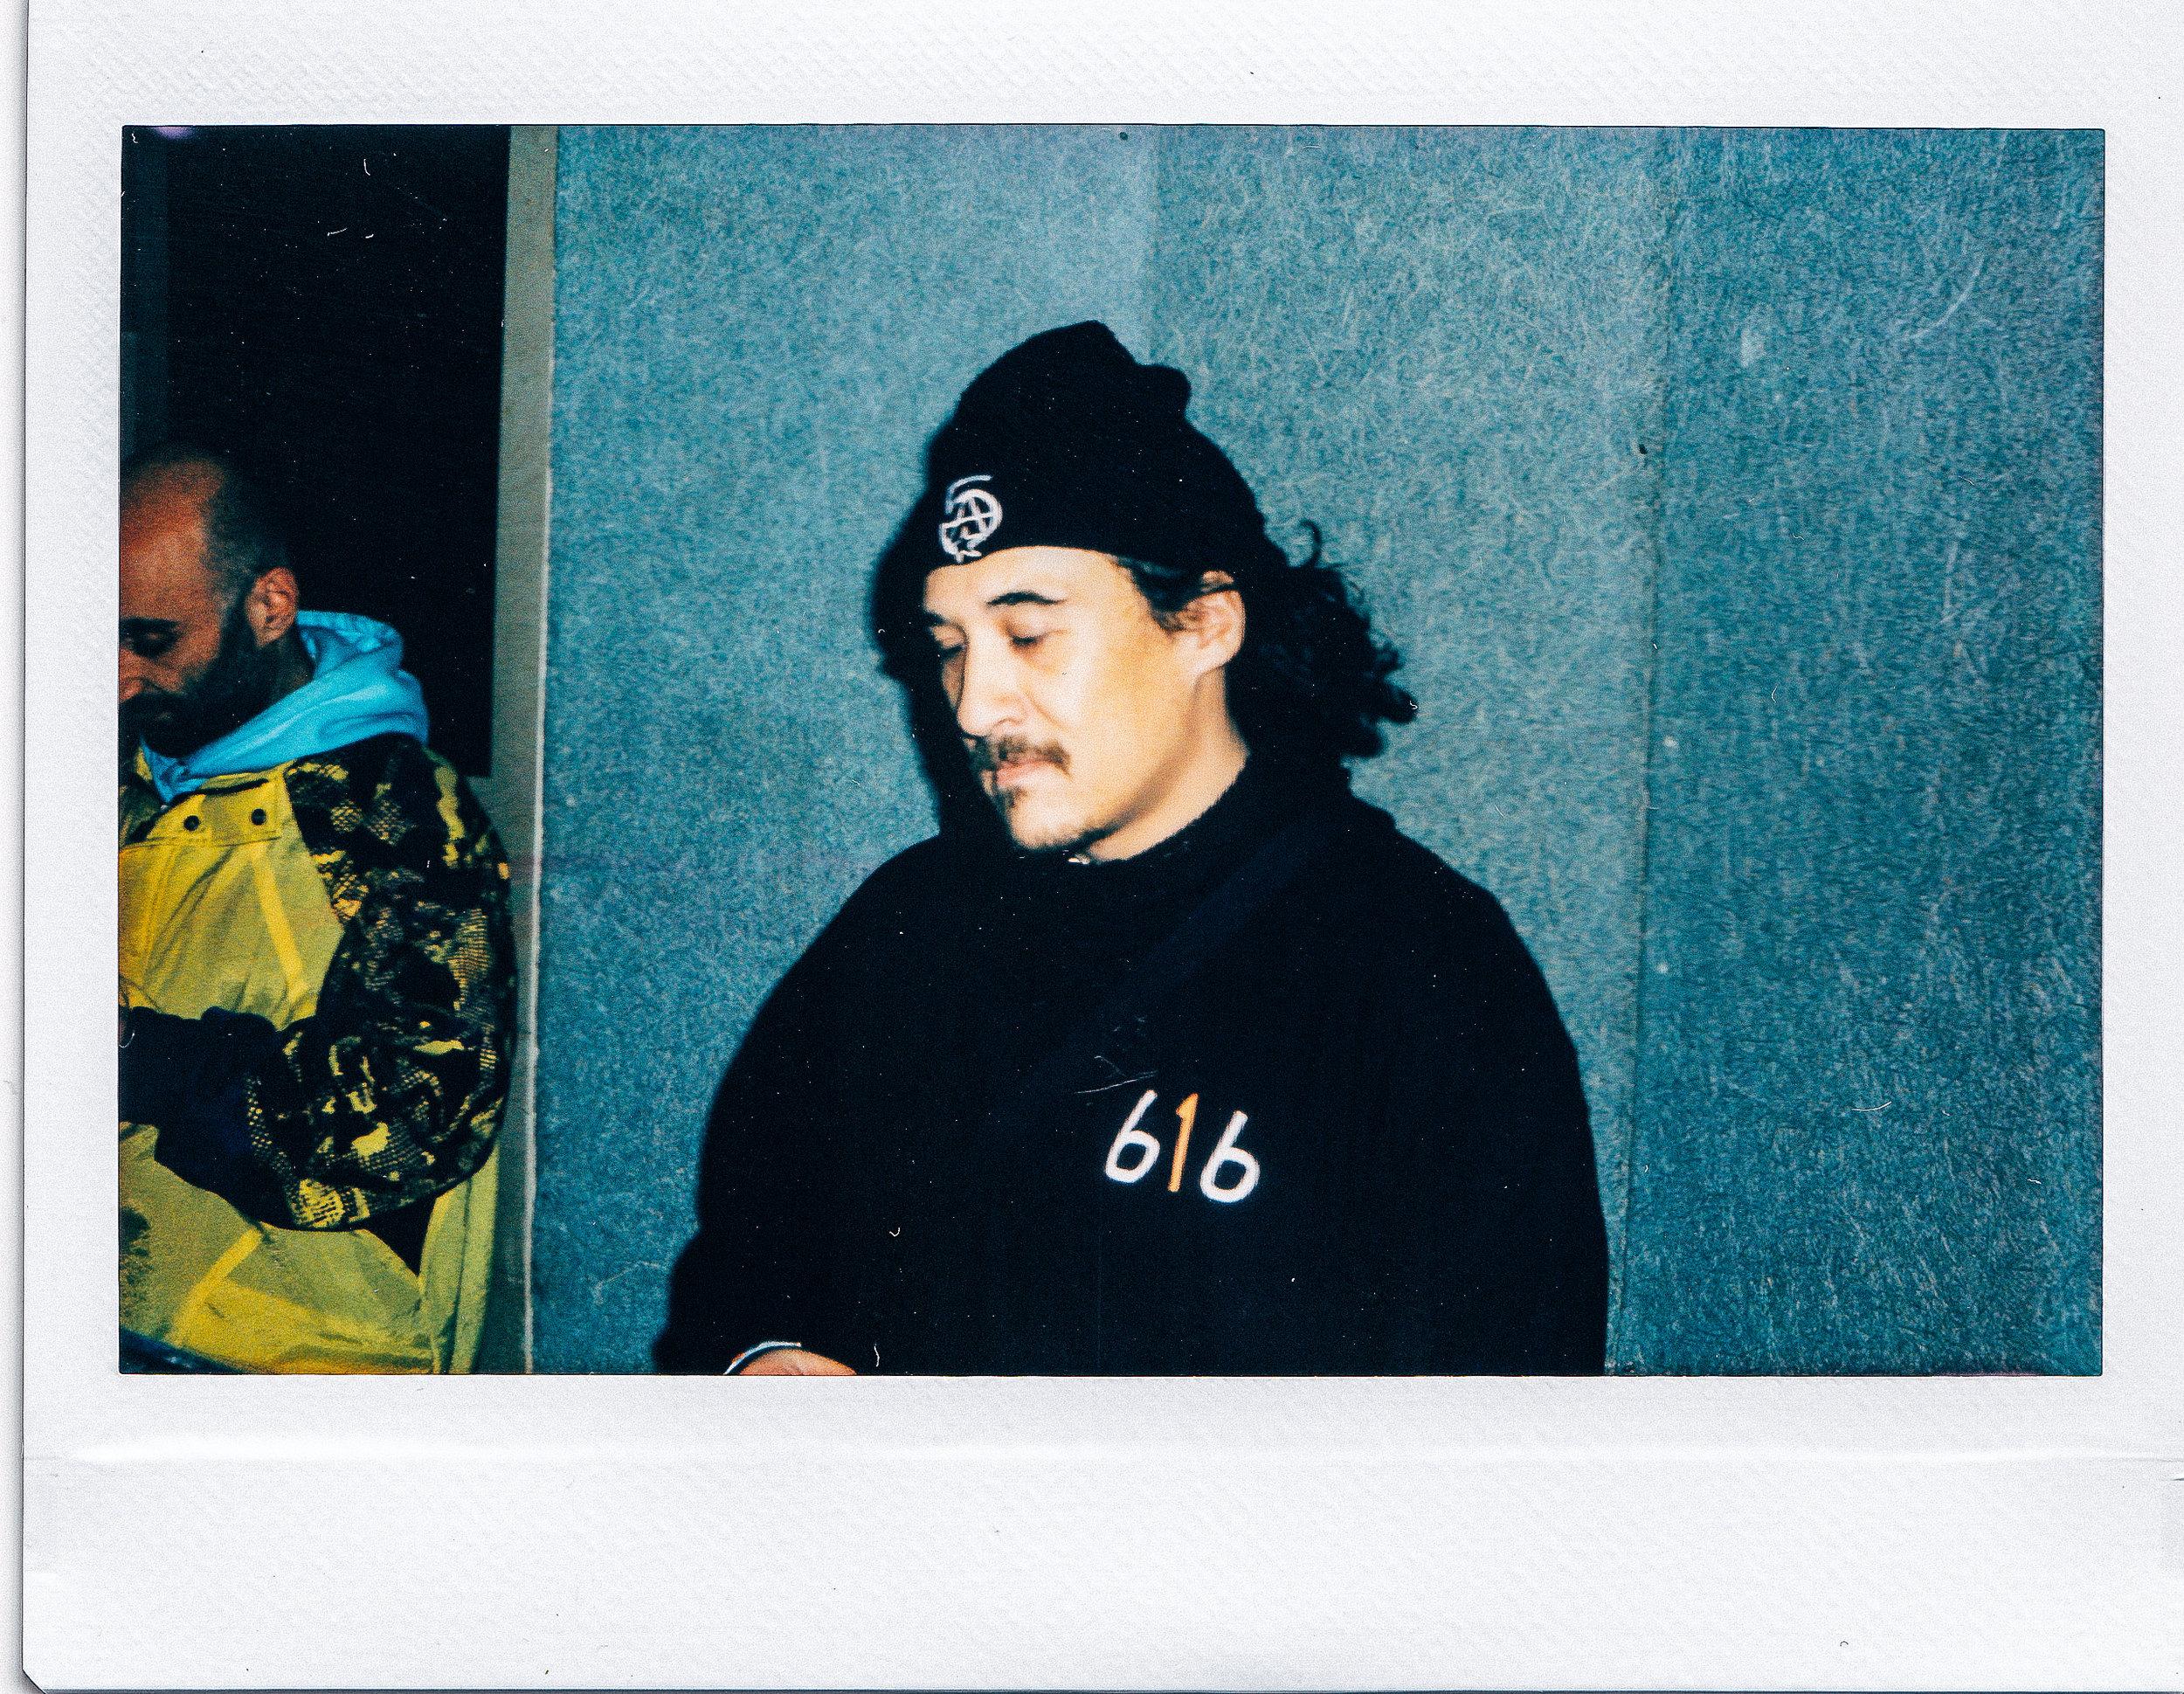 Jam_Baxter_Touching_Scenes_Polaroids-17.jpg